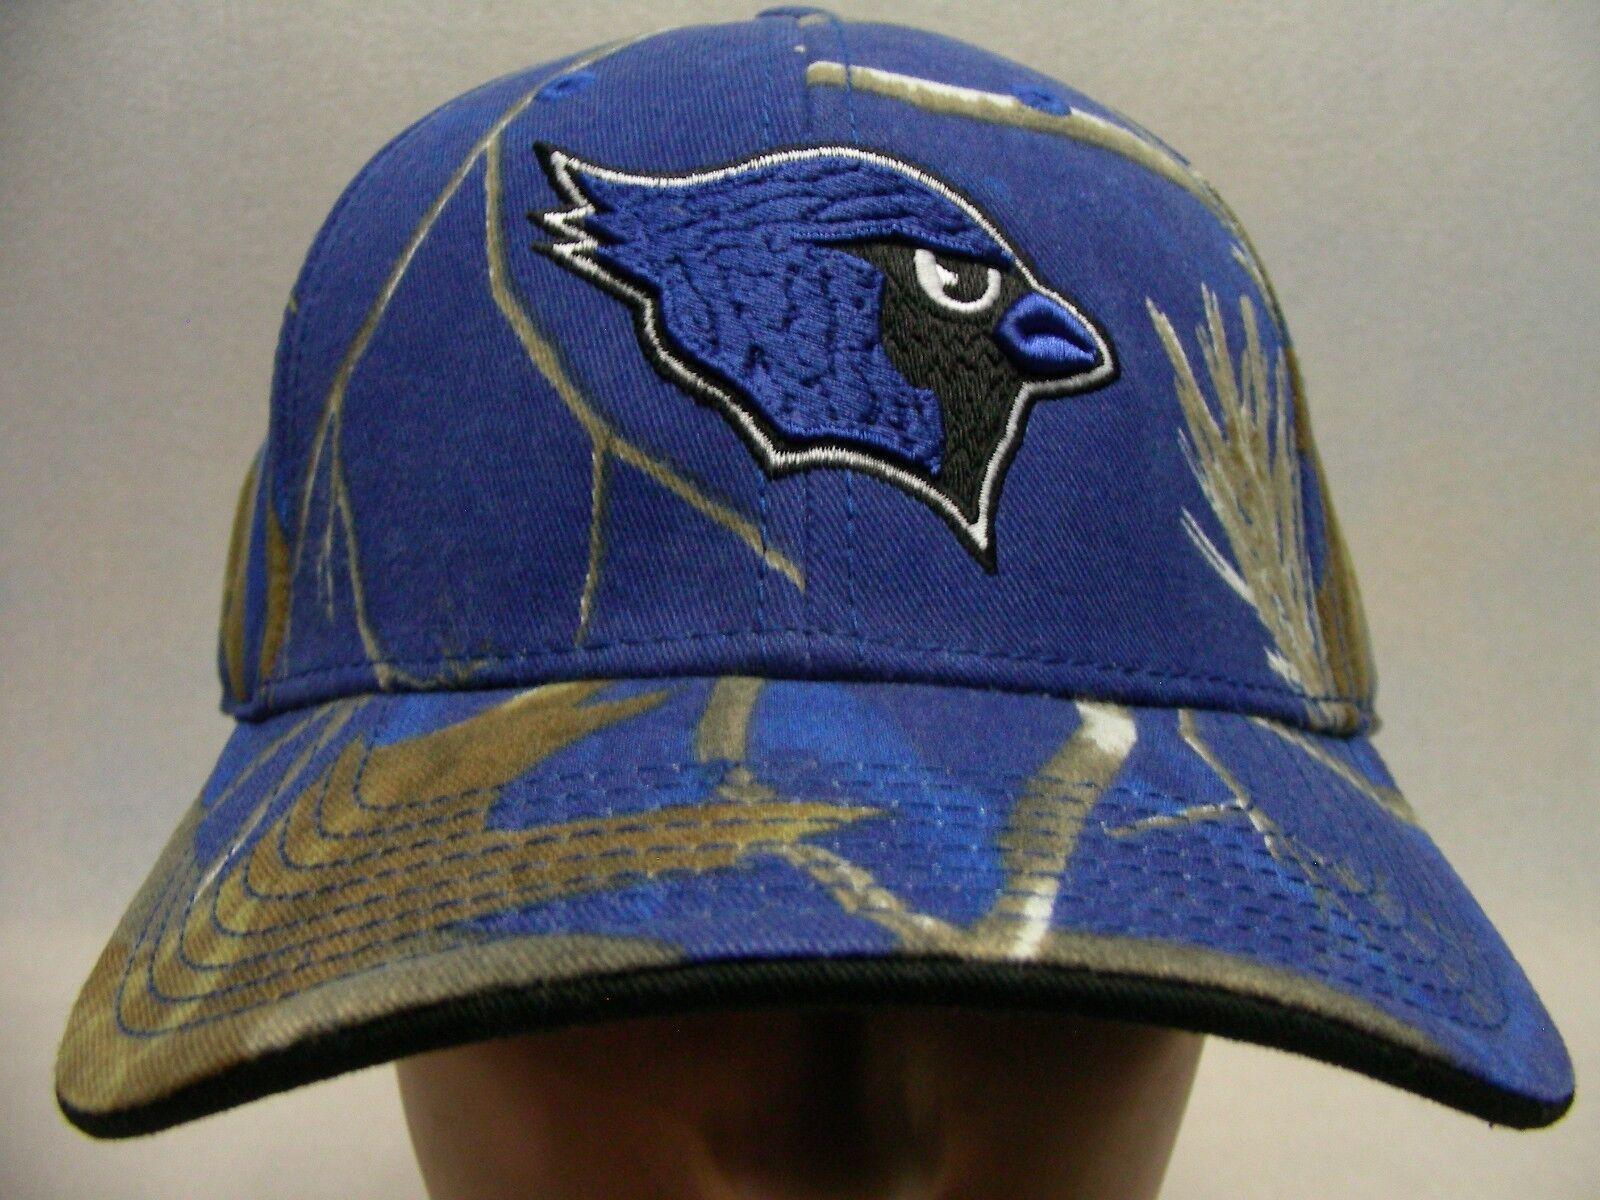 WB BLUE CARDINALS - CAP THE GAME - ADJUSTABLE BALL CAP - HAT 818640